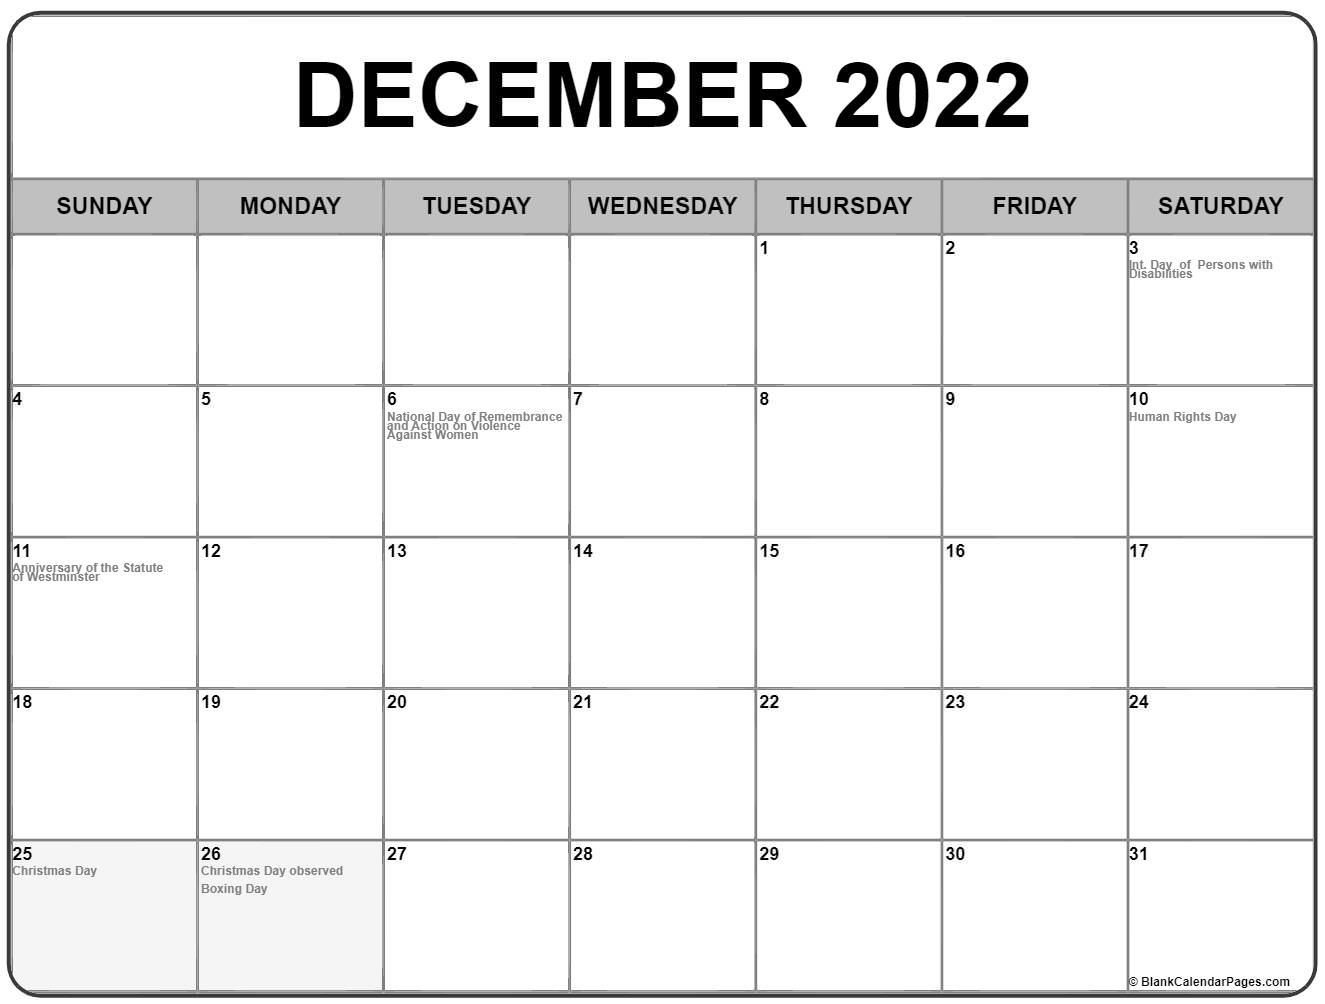 December 2018 calendar with Canadian holidays